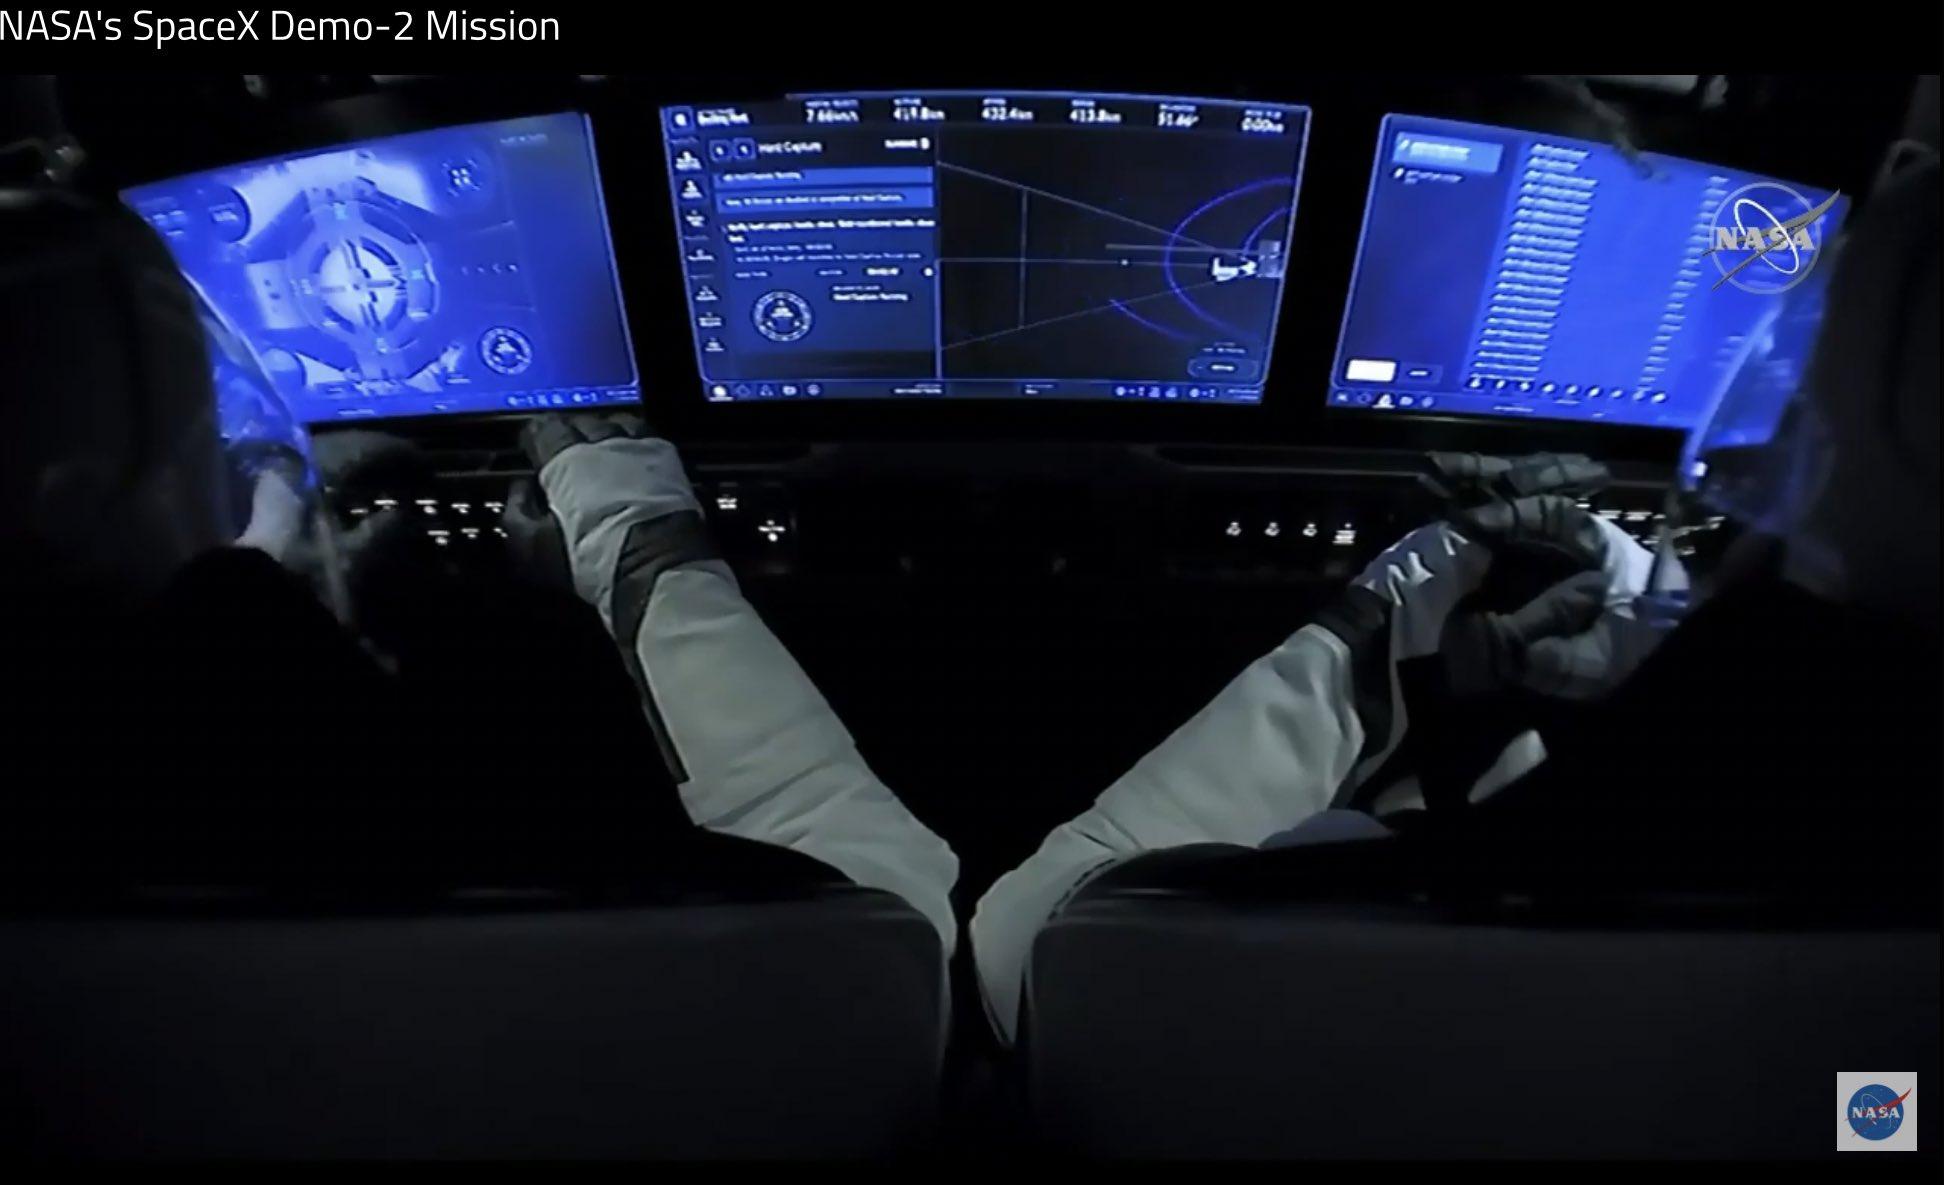 Screenshot showing control screens for the dock procedure.